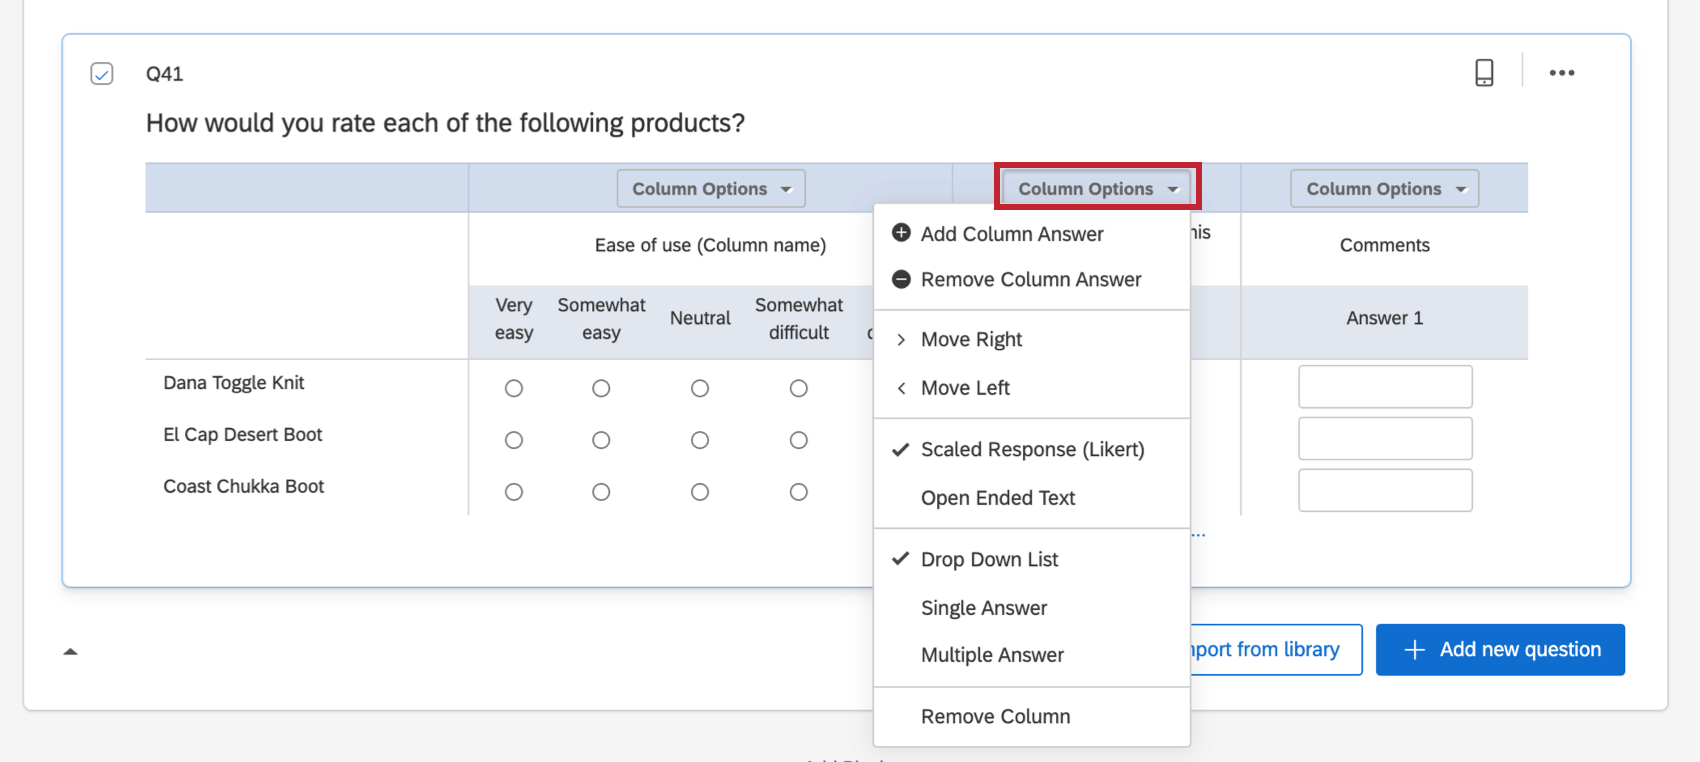 column options dropdown